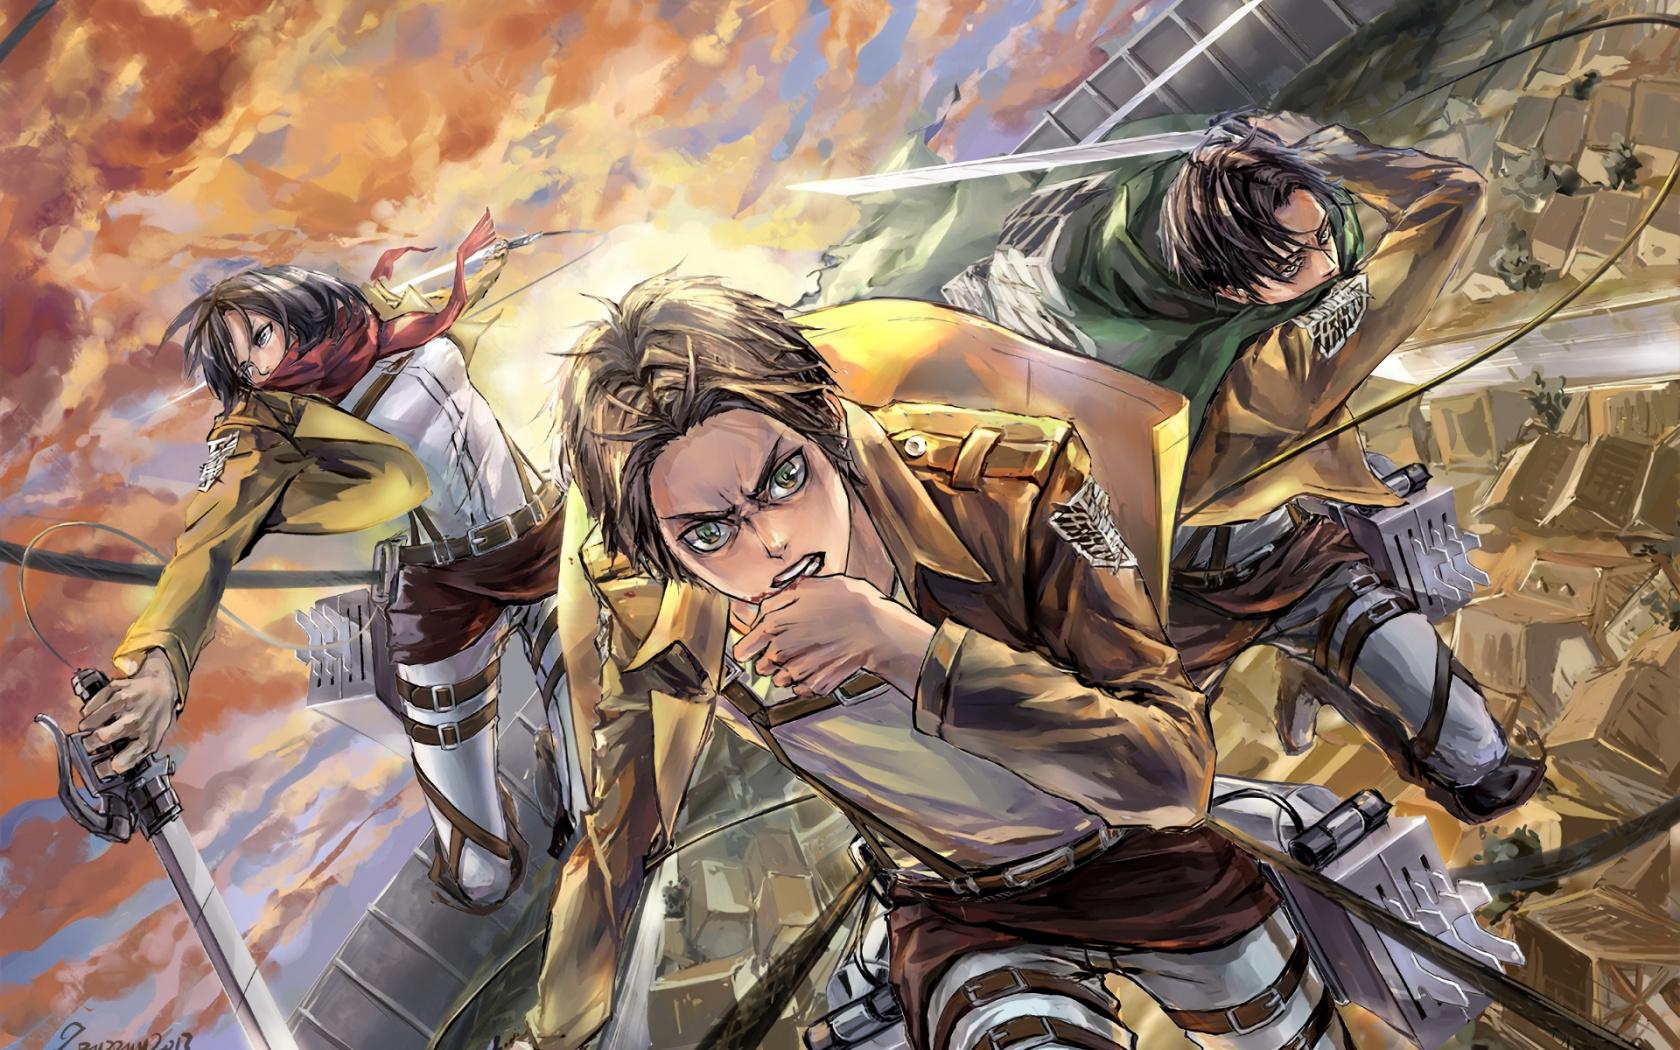 Wallpaper Mikasa Ackerman Eren Yeager Levi Ackerman Attack On Titan Wallpaper Epic 475259 Hd Wallpaper Backgrounds Download